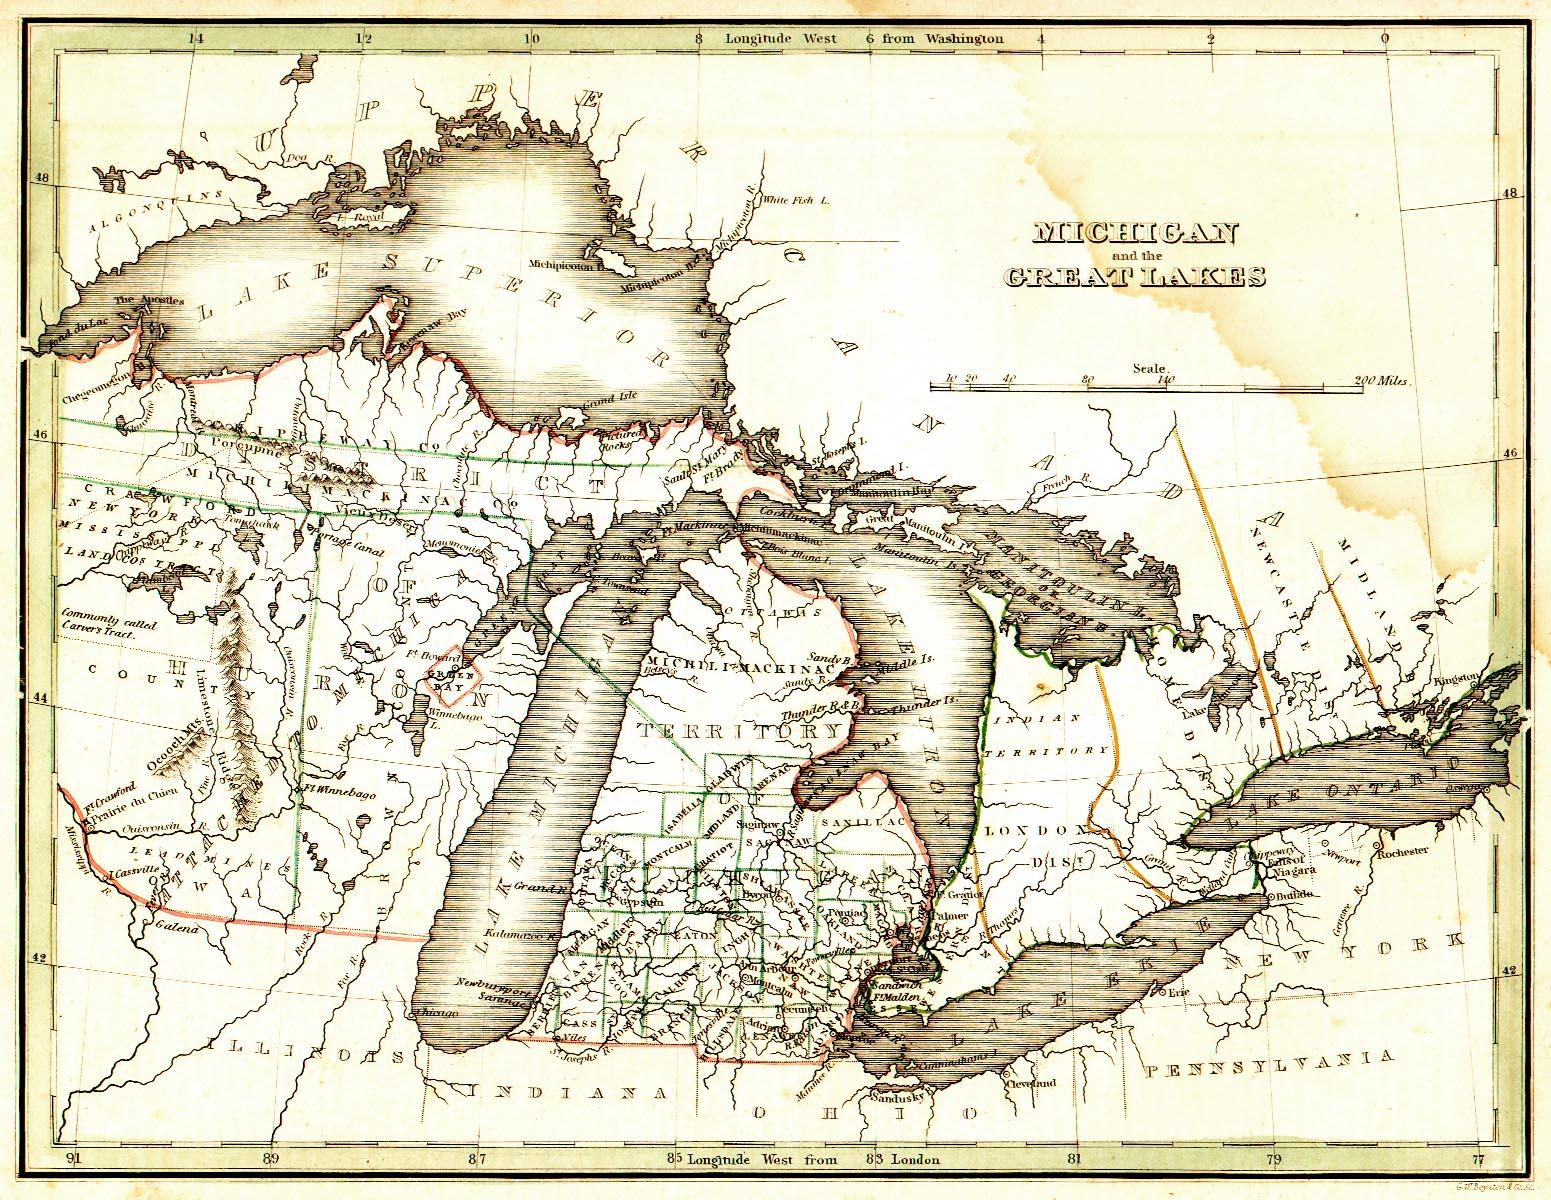 Coleman Michigan Map.Michigan Maps Michigan Digital Map Library Table Of Contents